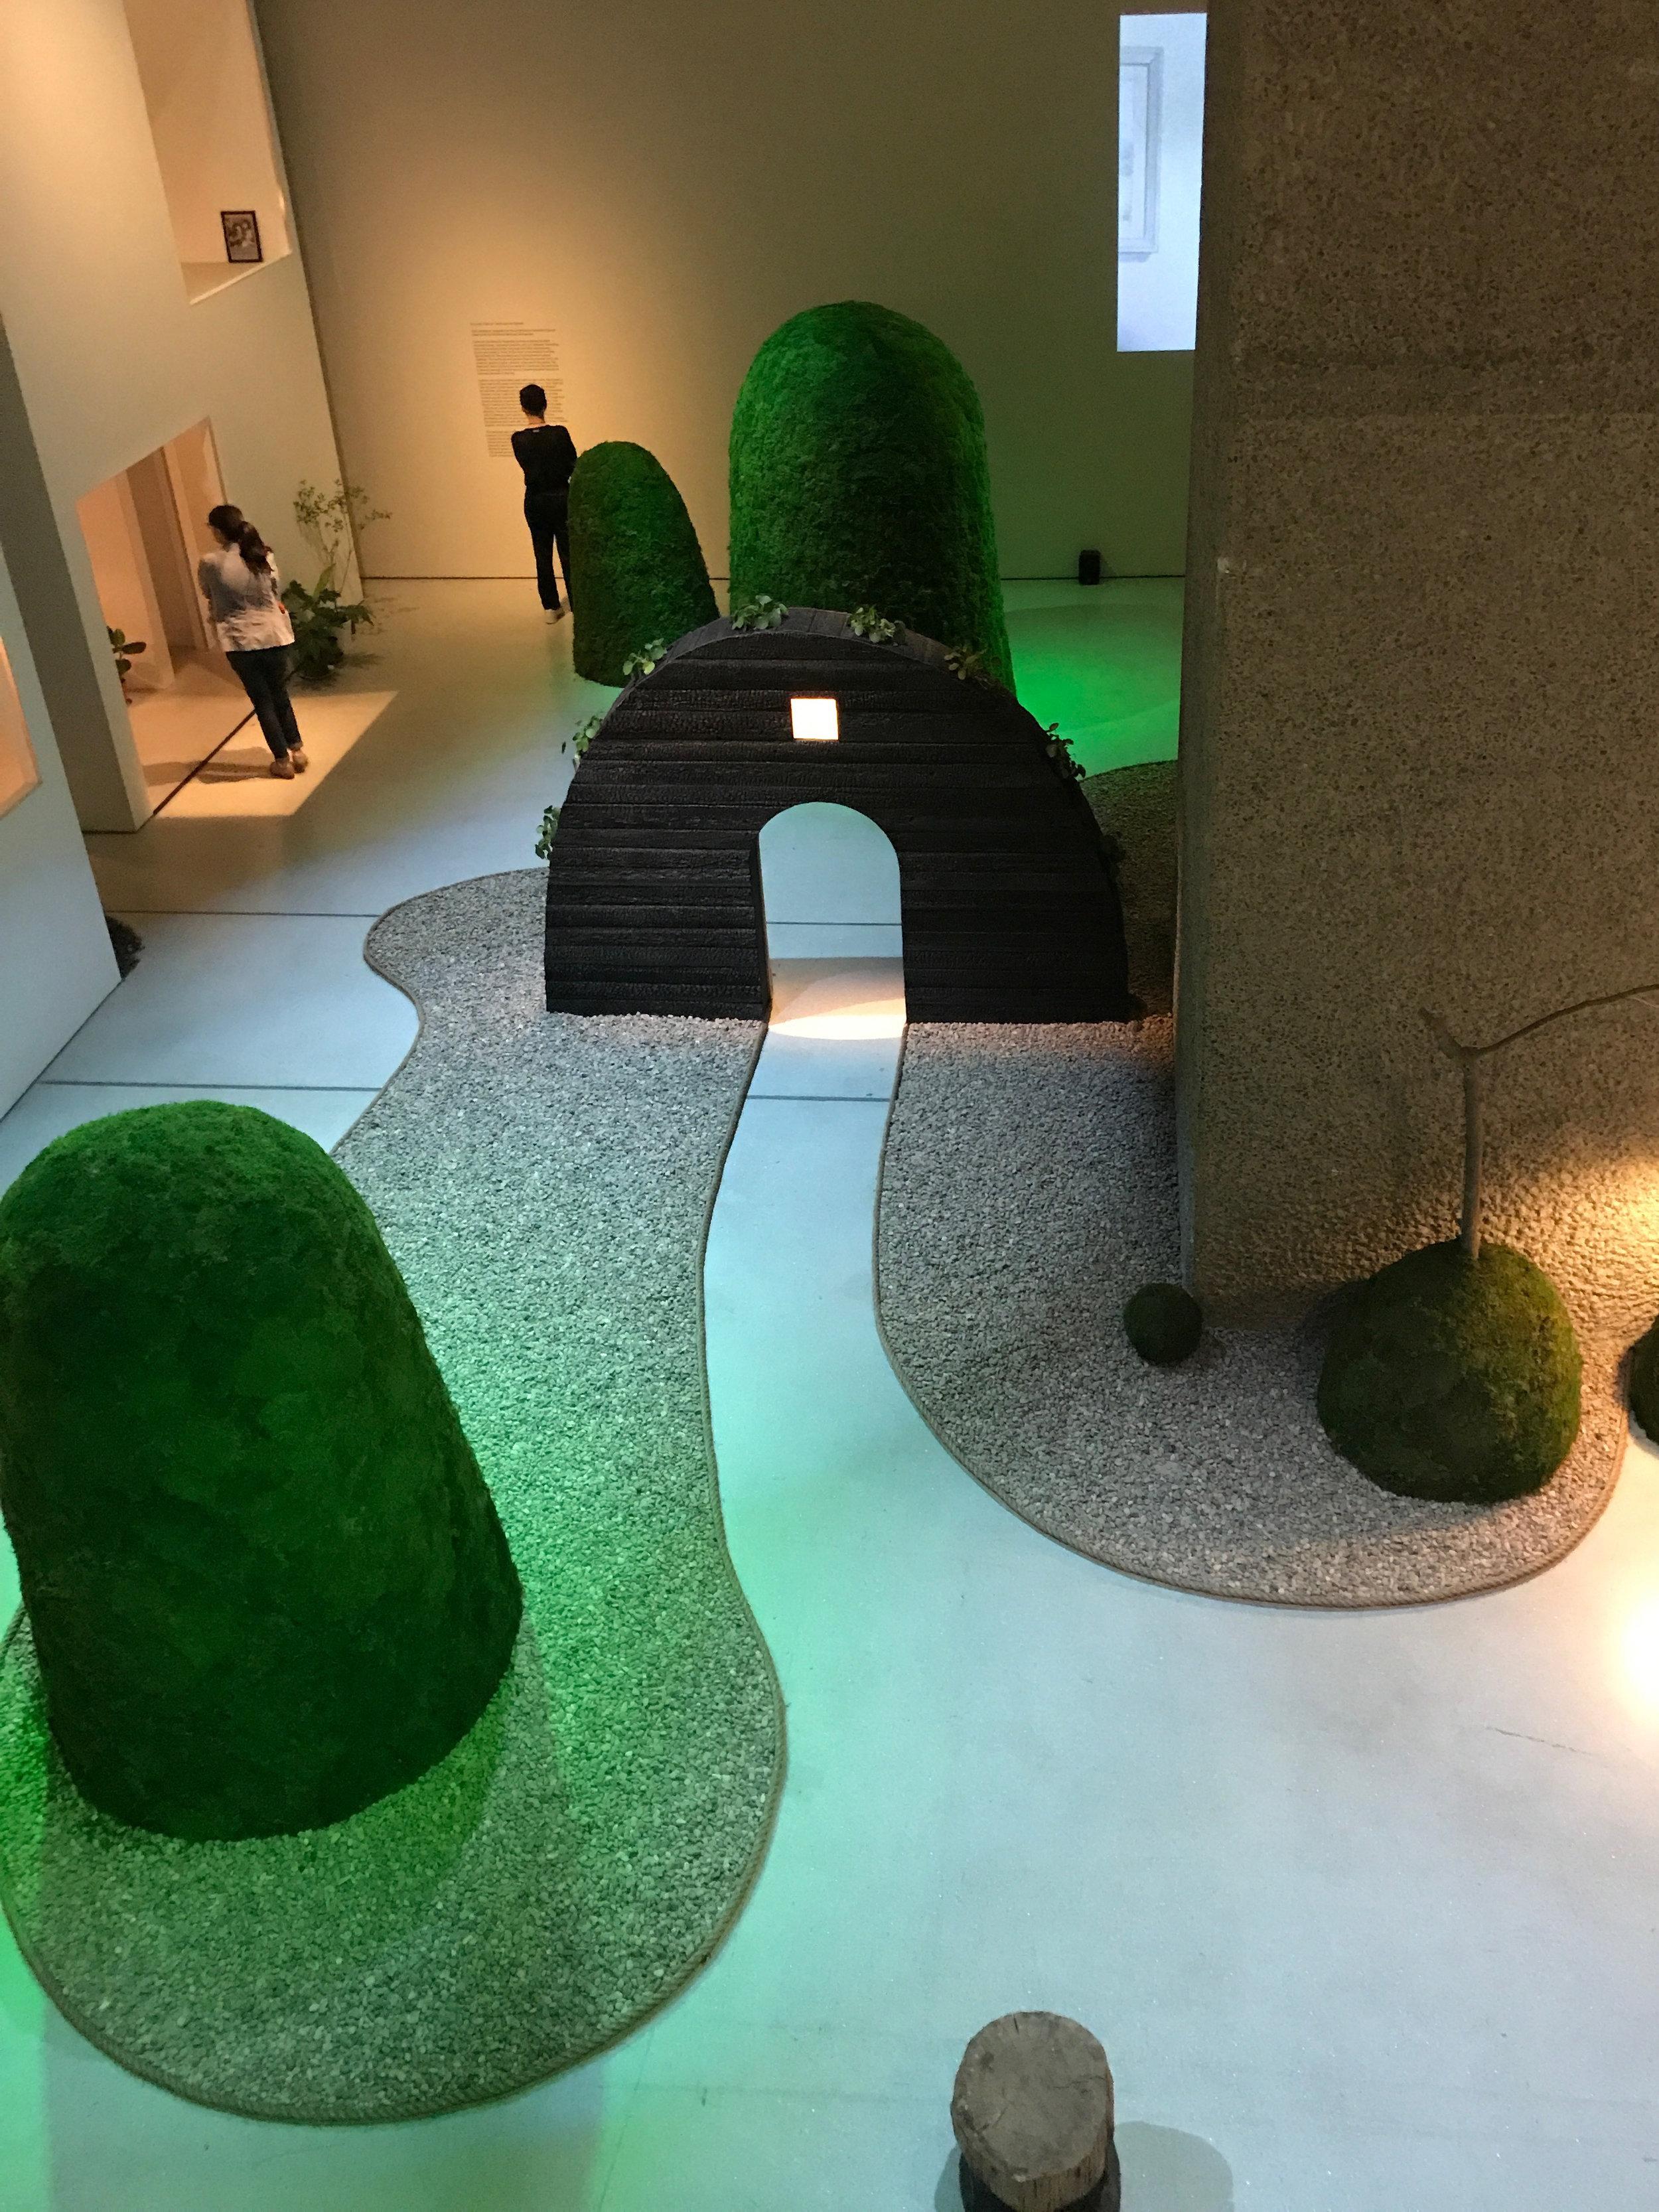 Garden designed by Terunobu Fujimori